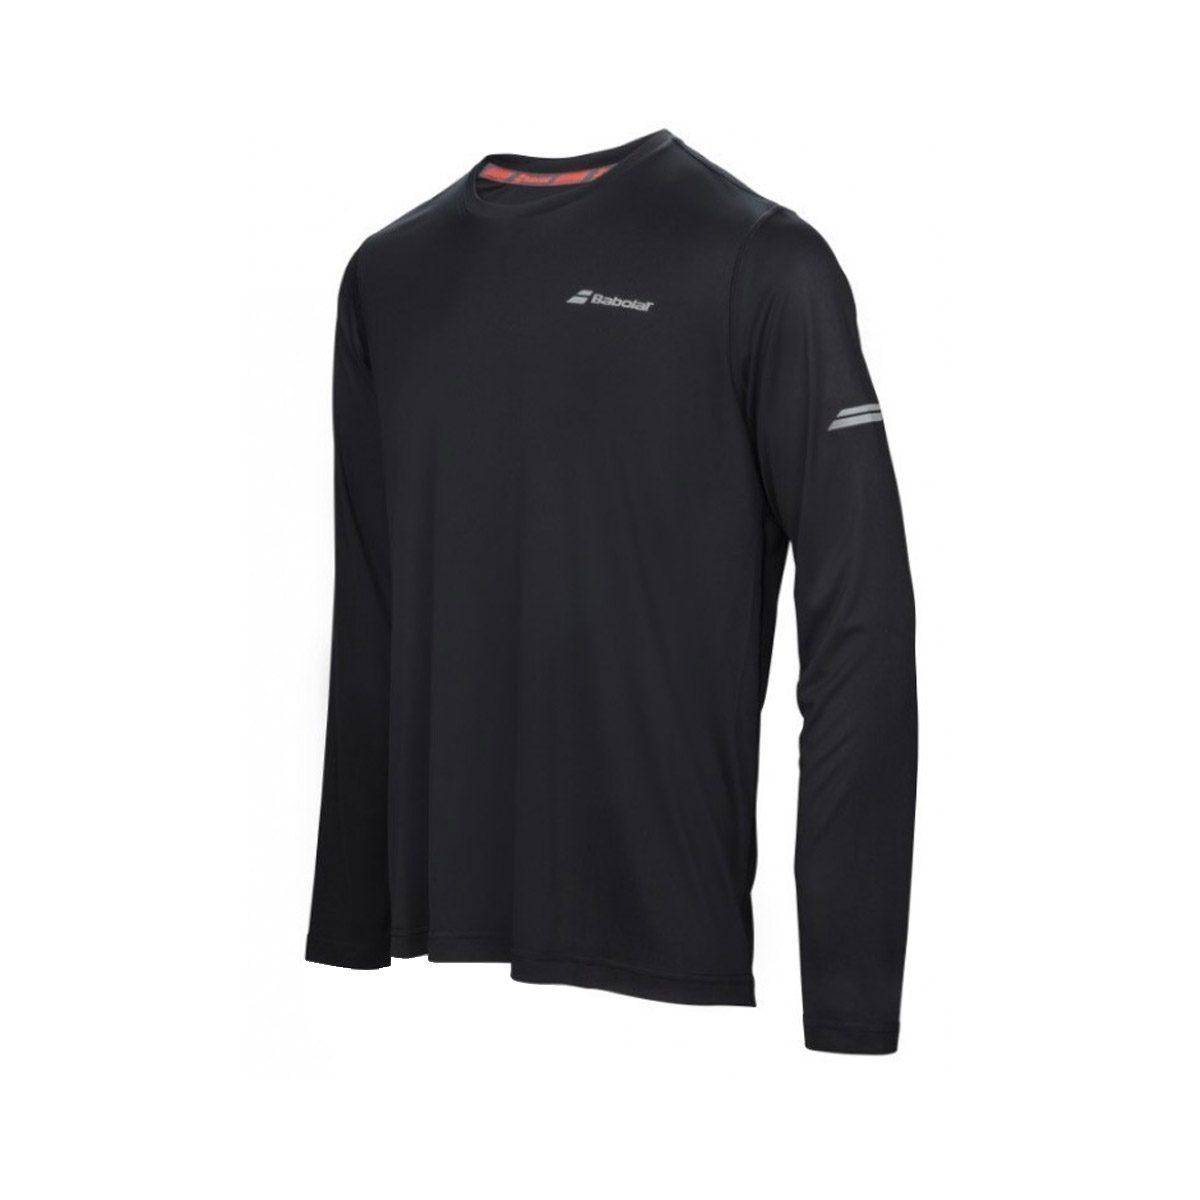 3507a256 Babolat Core Long Sleeve Men's Top – Black - Peake Performance Sports